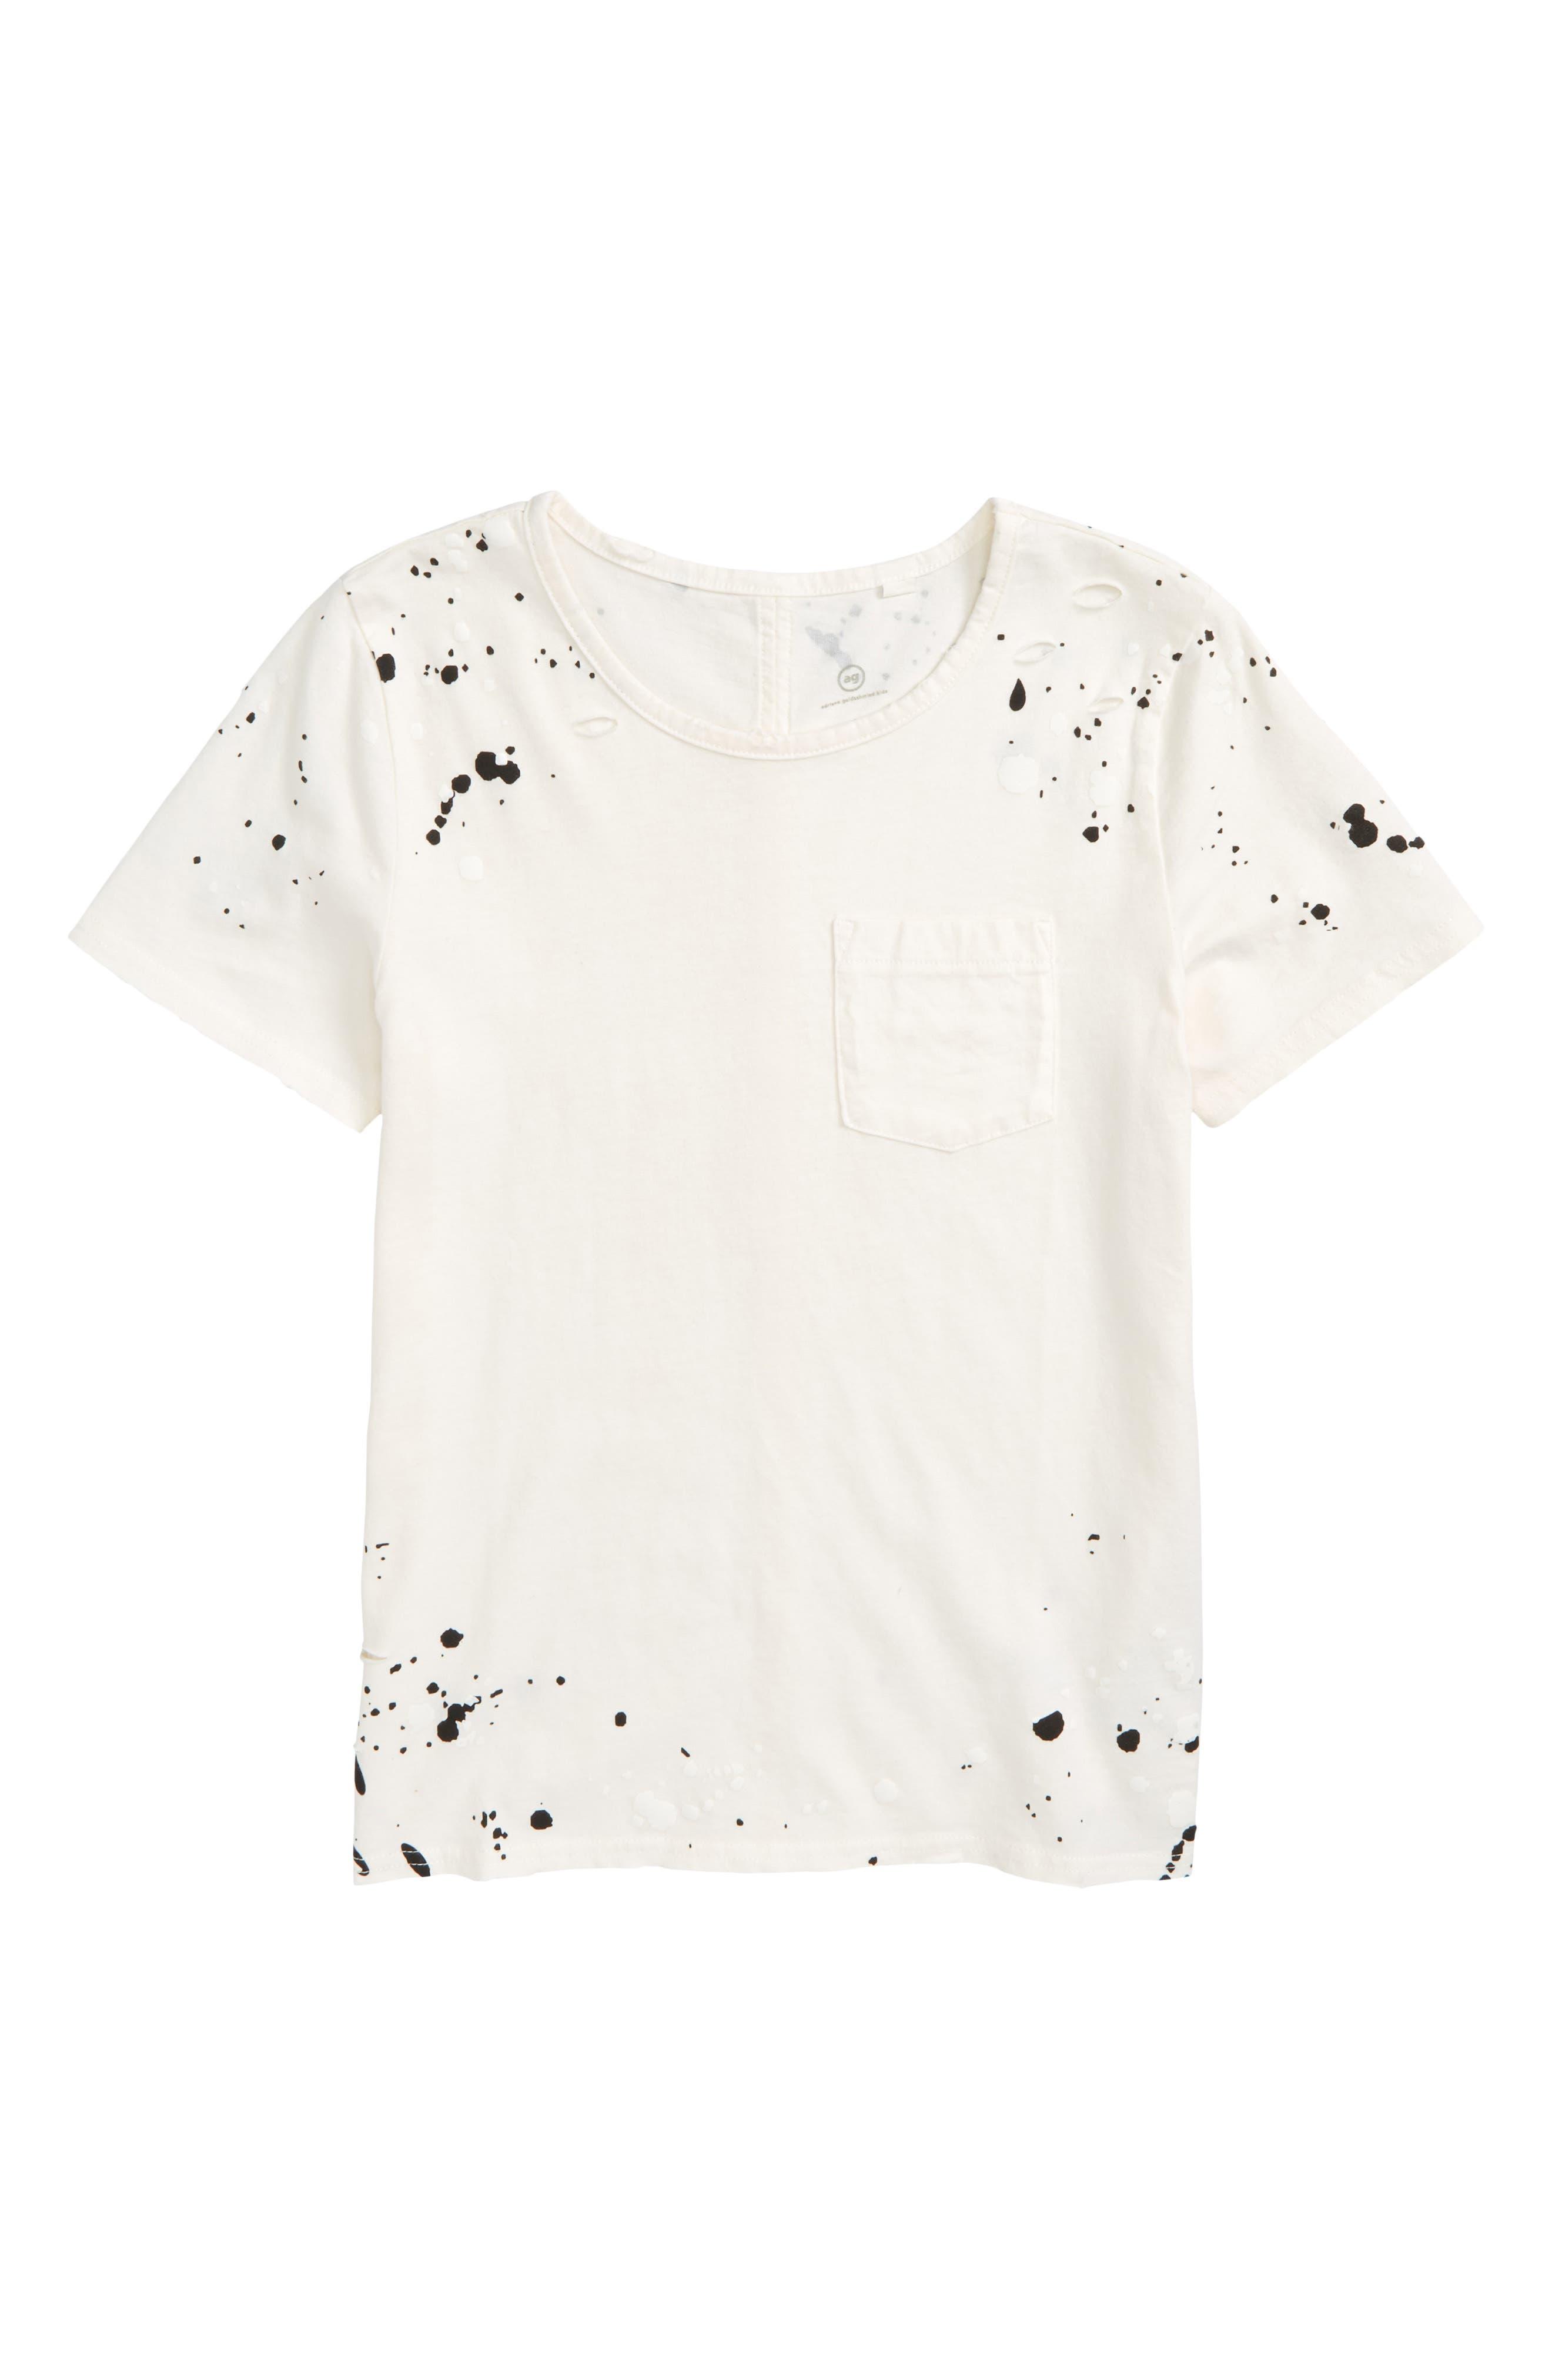 Waverly Paint Splatter Tee,                         Main,                         color, Bleach White/ Black